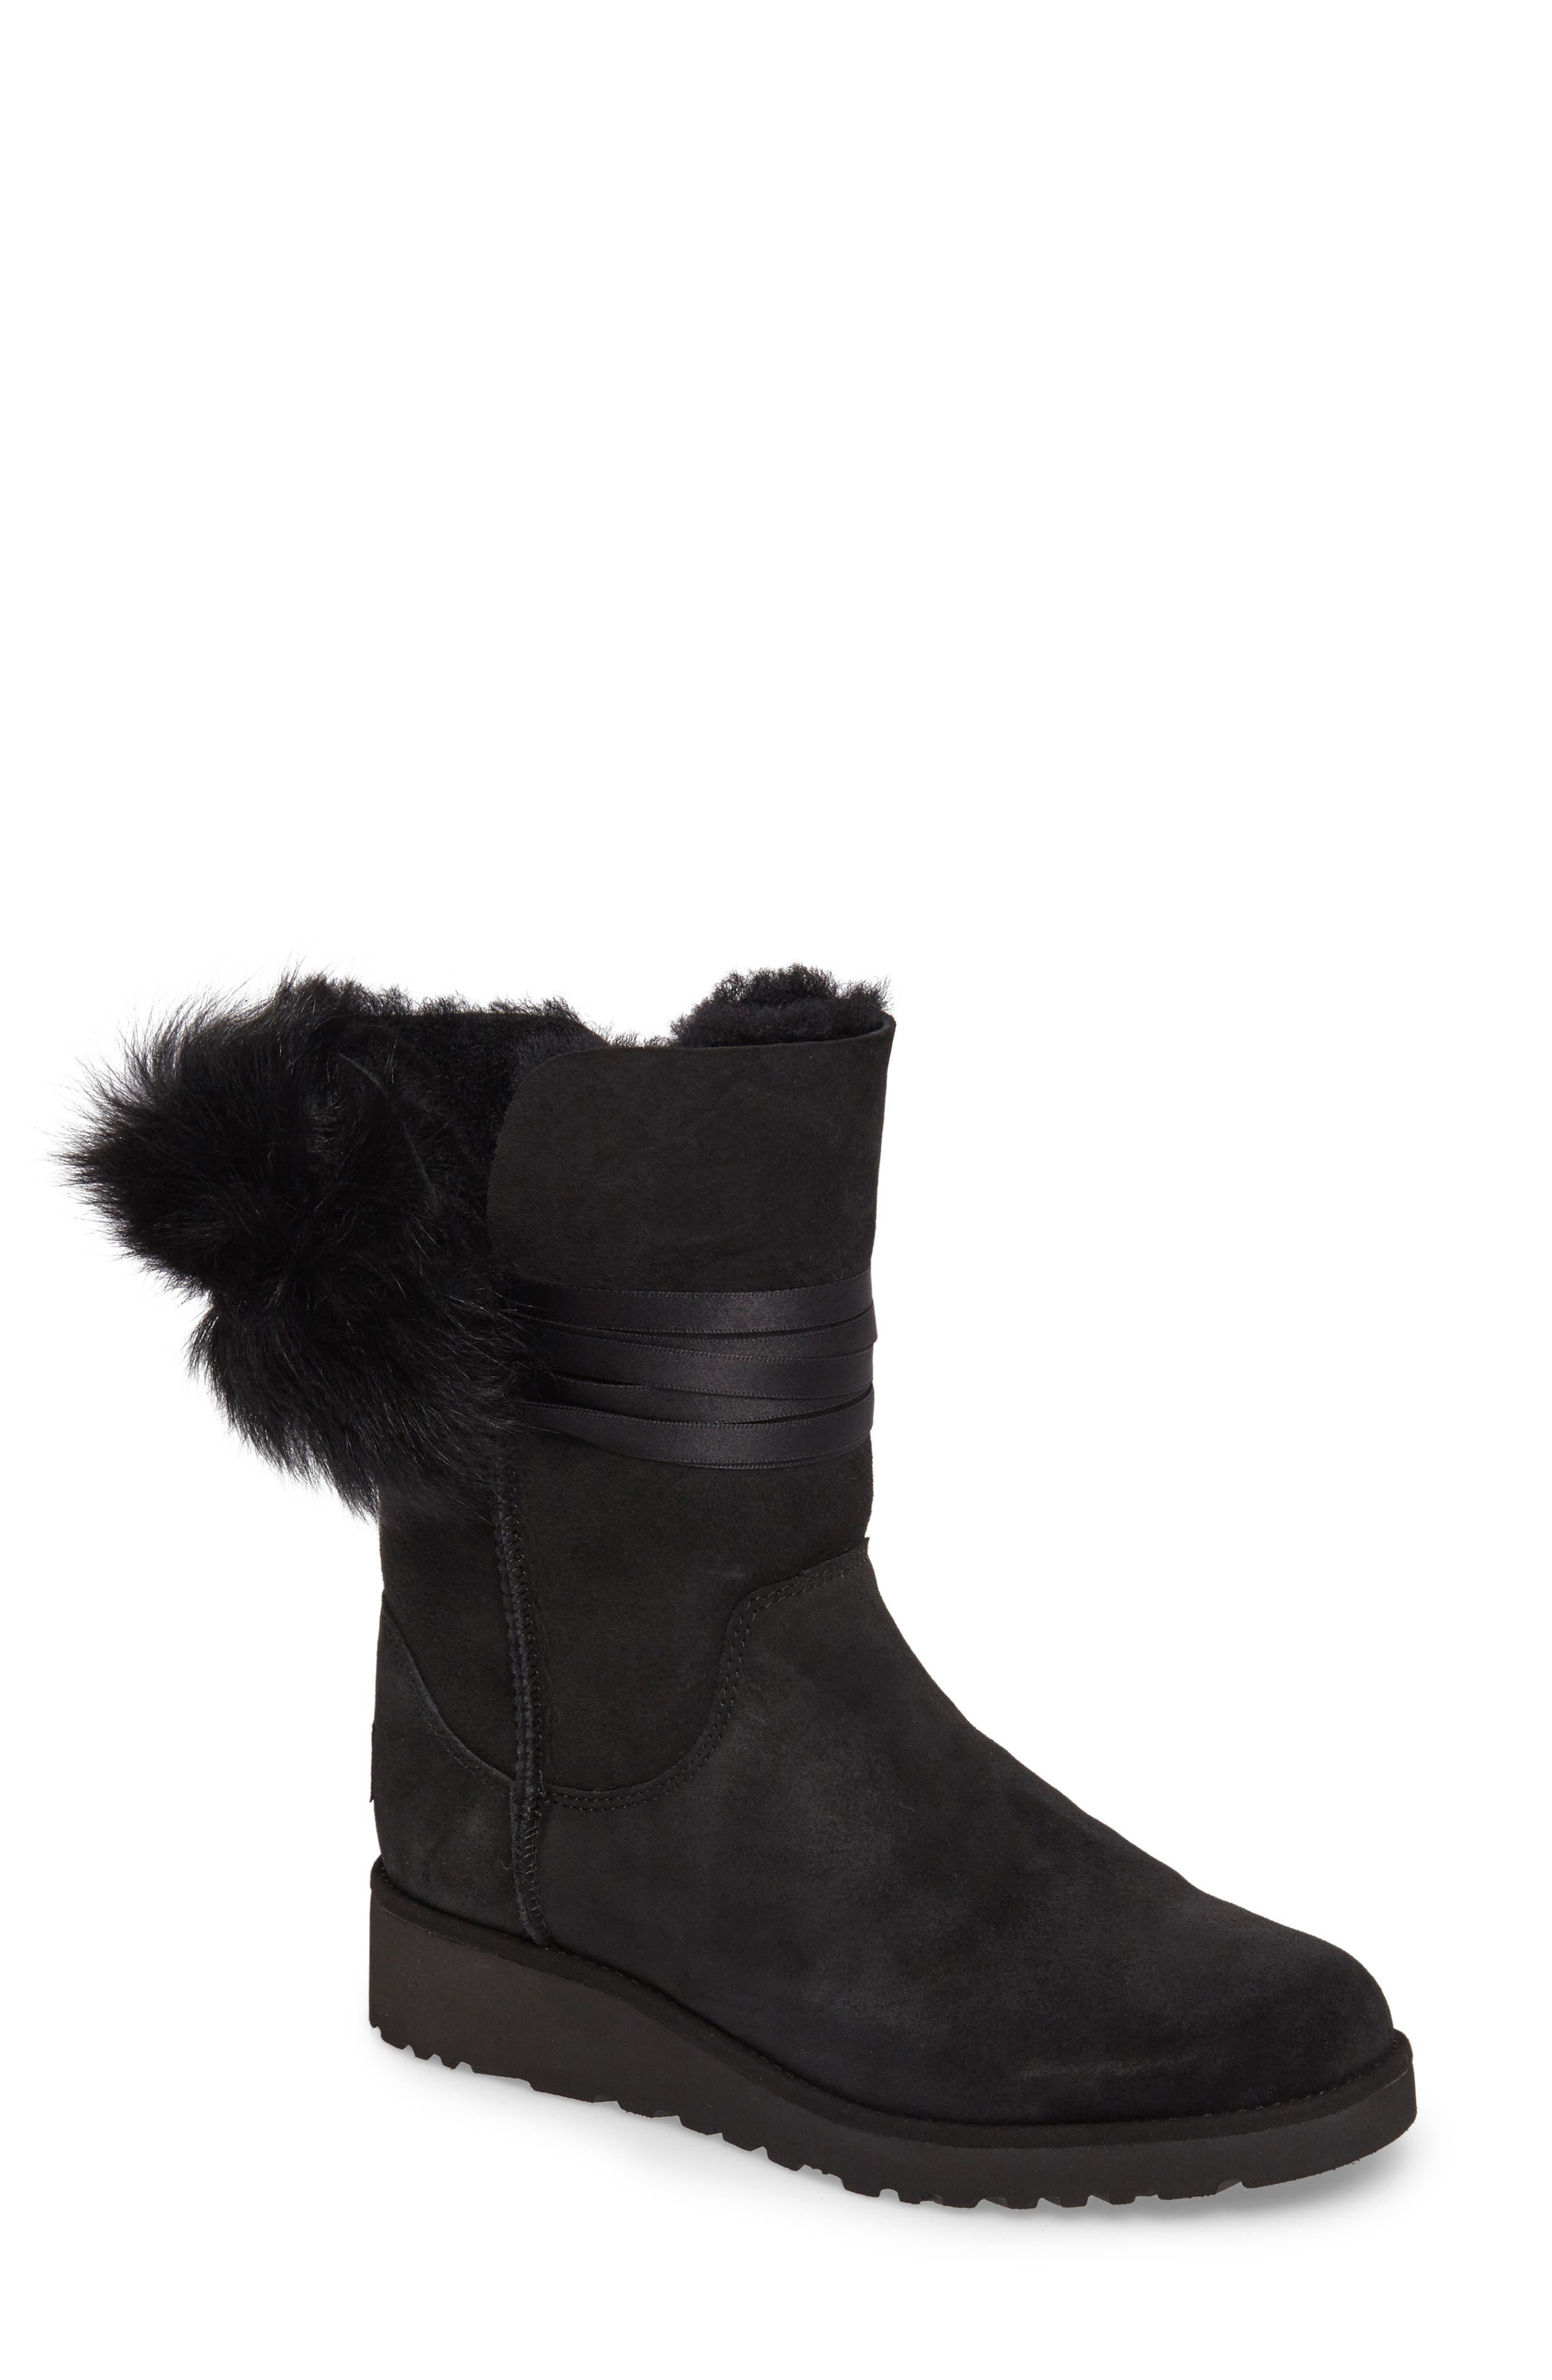 Main Image - UGG® Brita Boot (Women)